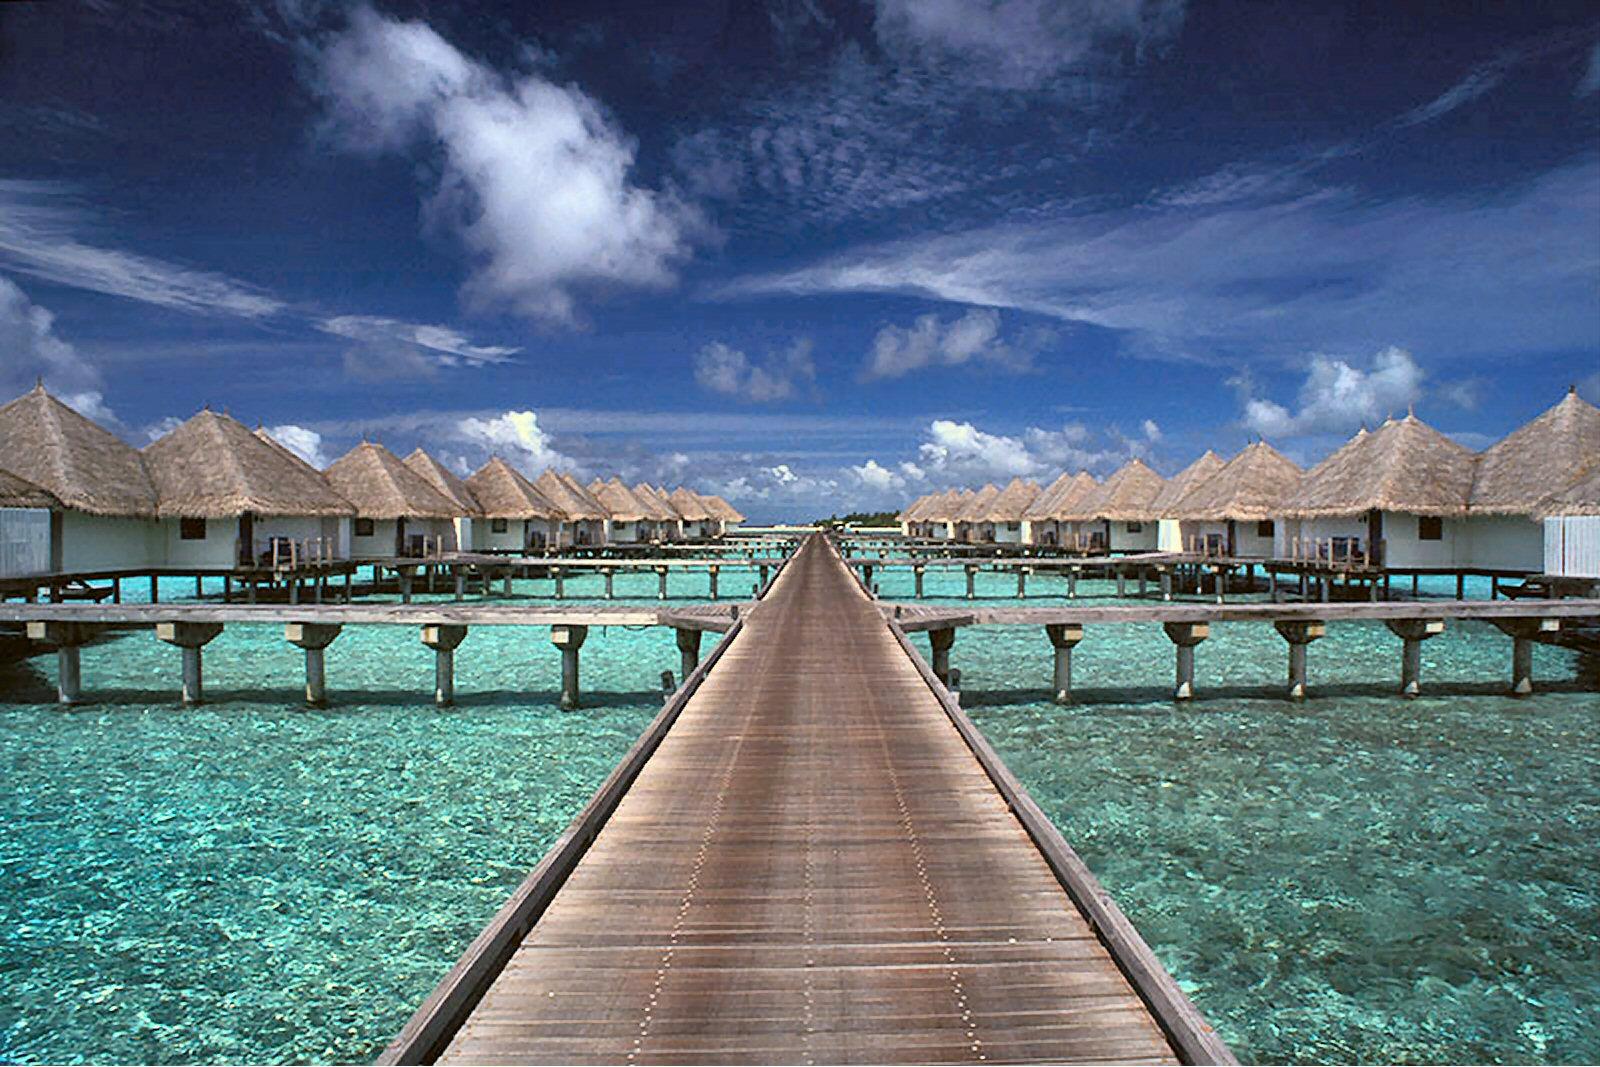 http://1.bp.blogspot.com/-9-vUUBJtcyU/TmnvJAaWjsI/AAAAAAAAJno/cMFjmN22-1c/s1600/Travel-Maldives-Land-Without-Roads.jpg